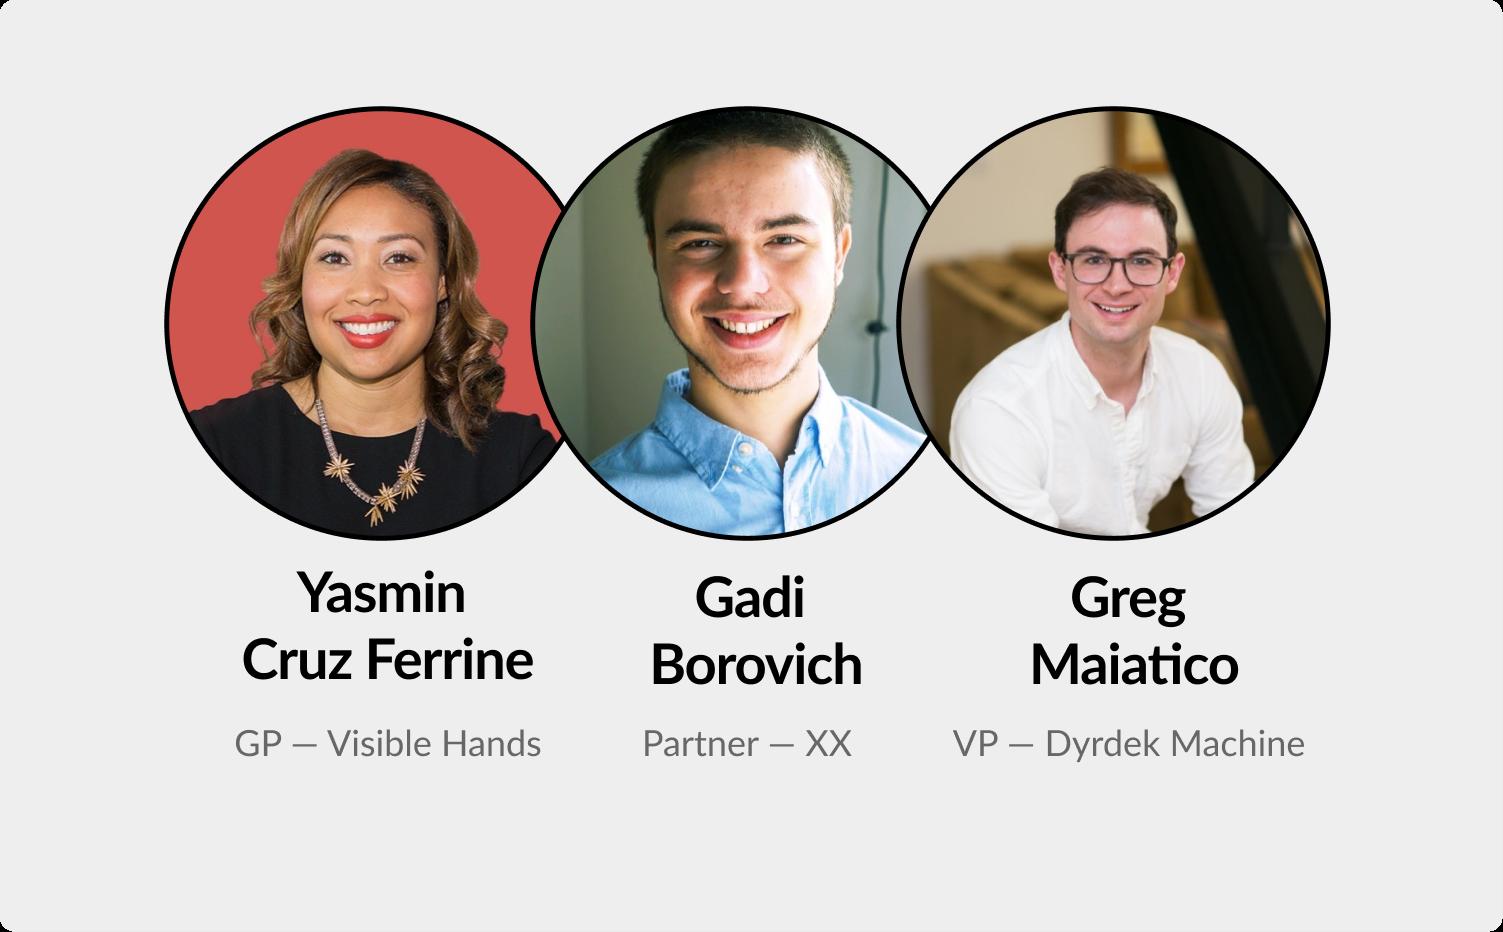 Navigating accelerators and studios: Yasmin Cruz Ferrine, Gadi Borovich, Greg Maiatico